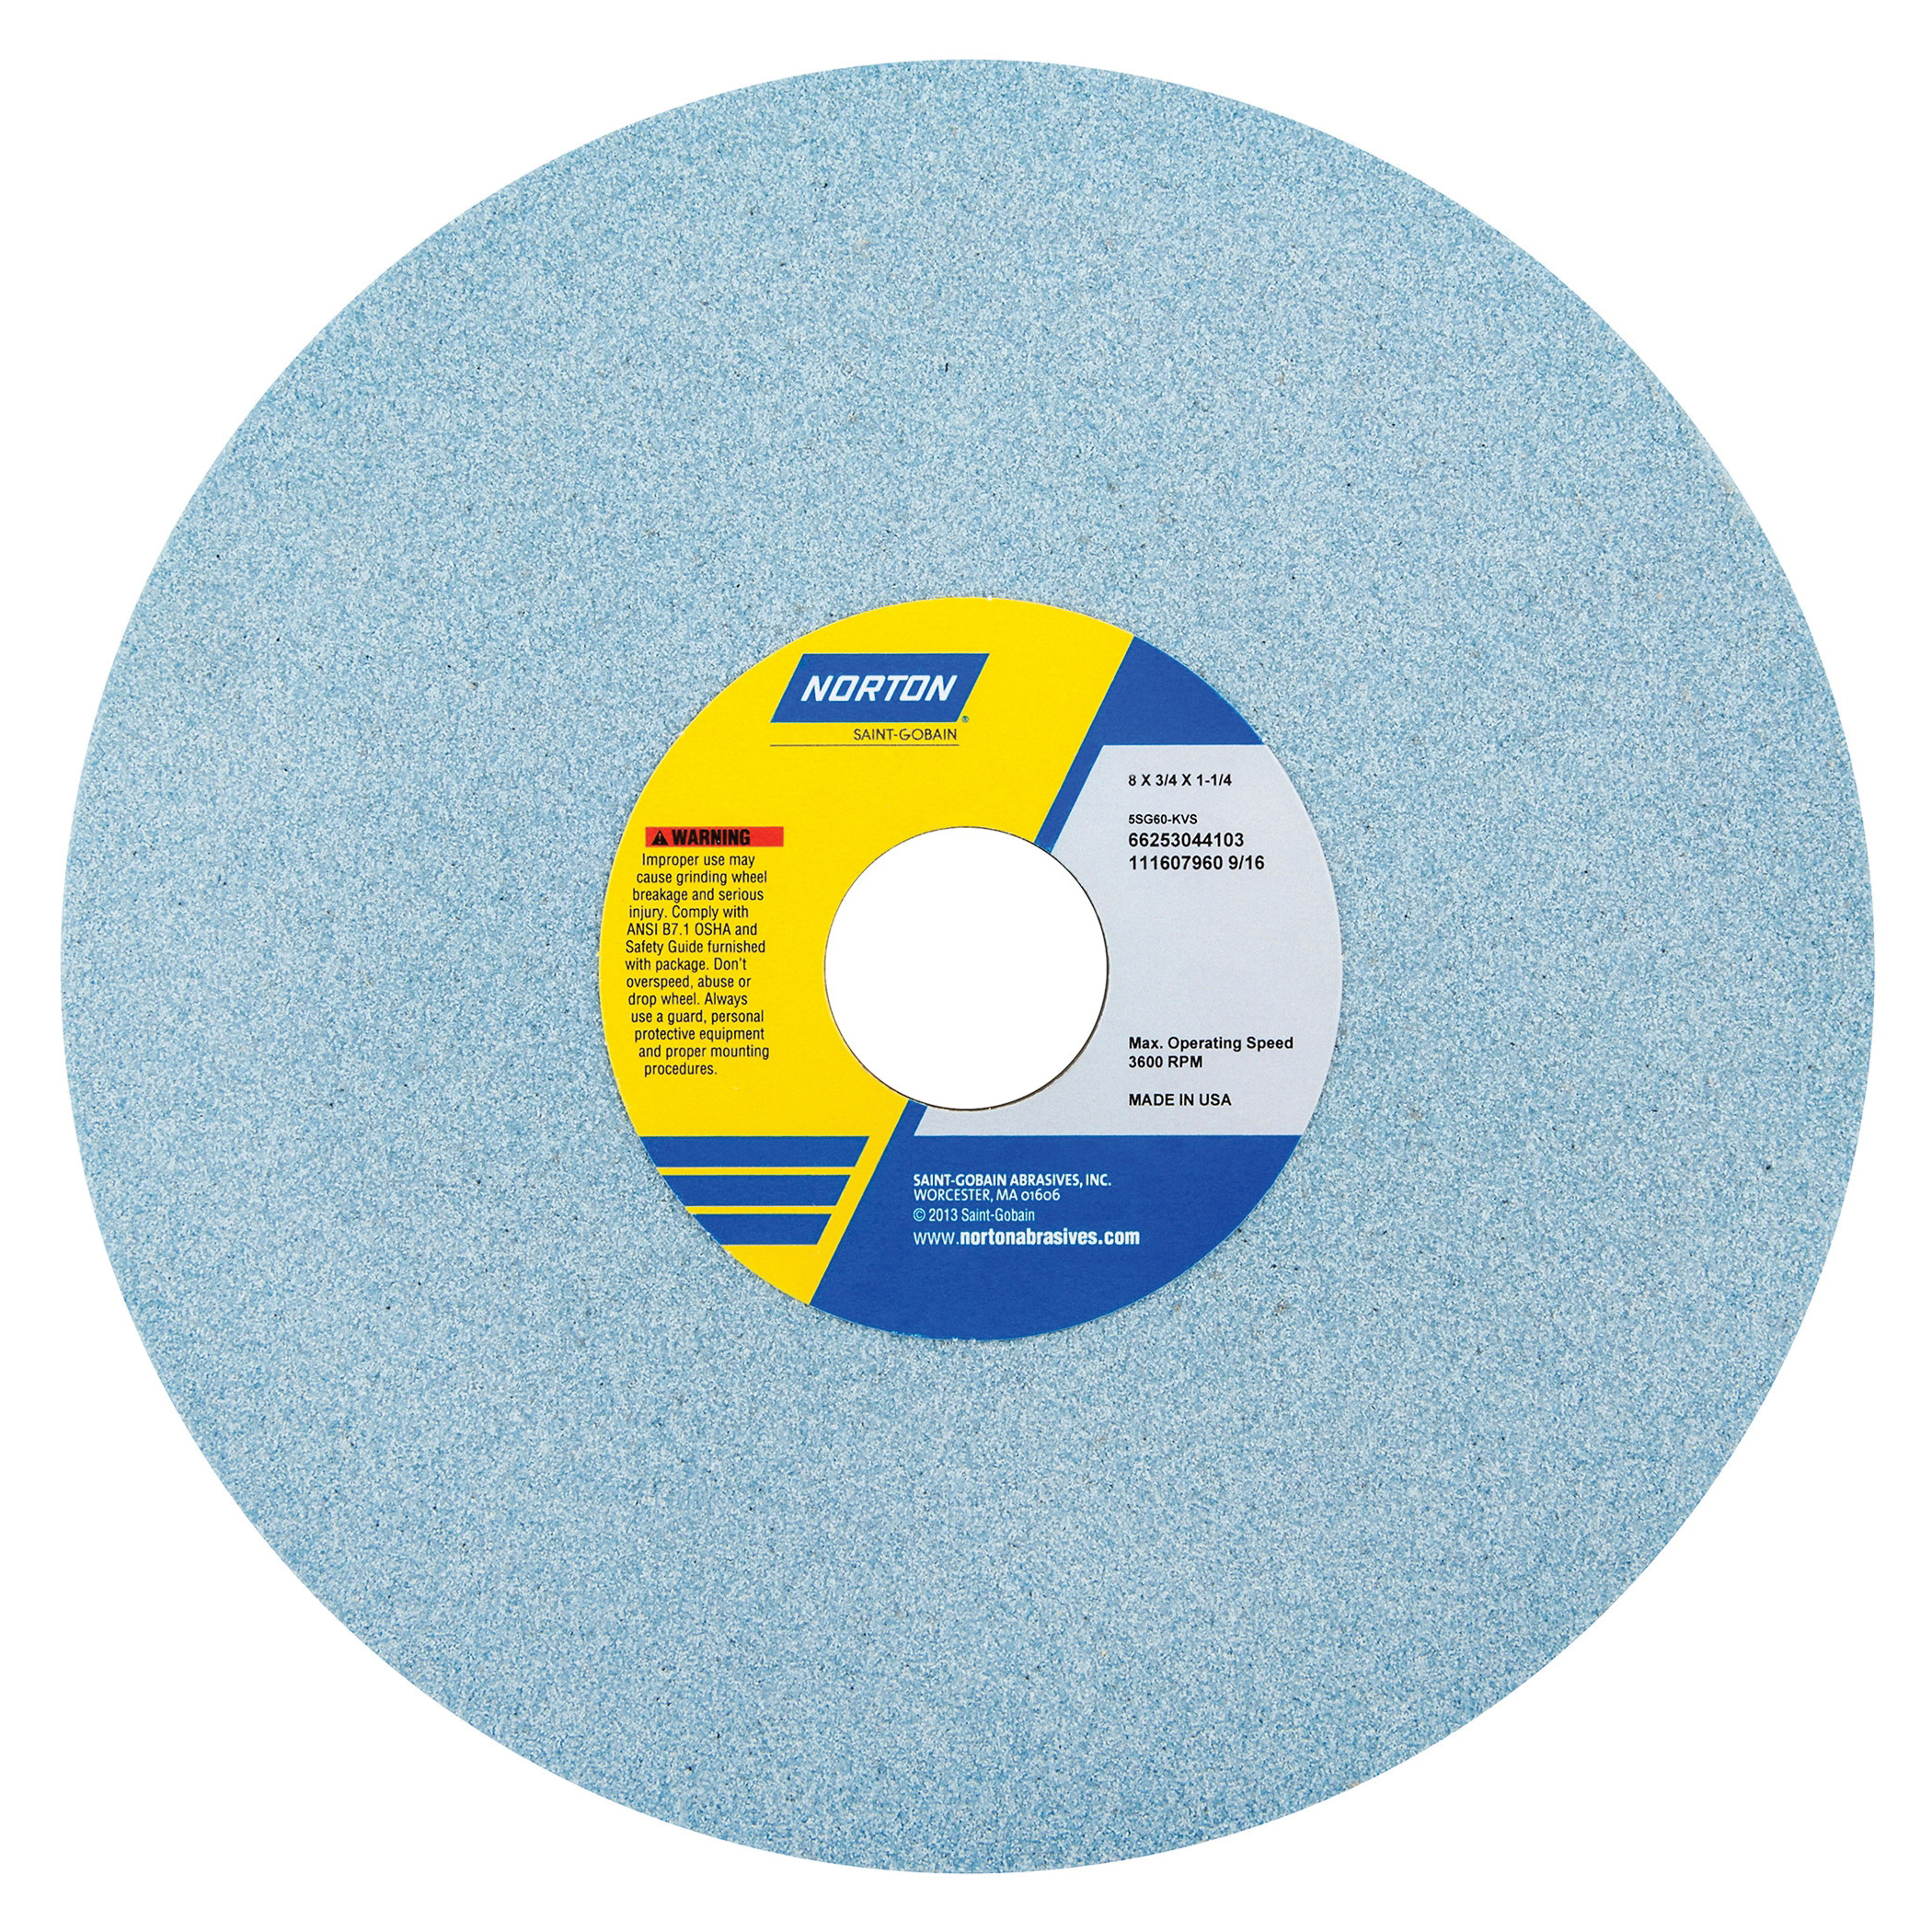 Norton® 66253044103 5SG Straight Toolroom Wheel, 8 in Dia x 3/4 in THK, 1-1/4 in Center Hole, 60 Grit, Ceramic Alumina/Friable Aluminum Oxide Abrasive